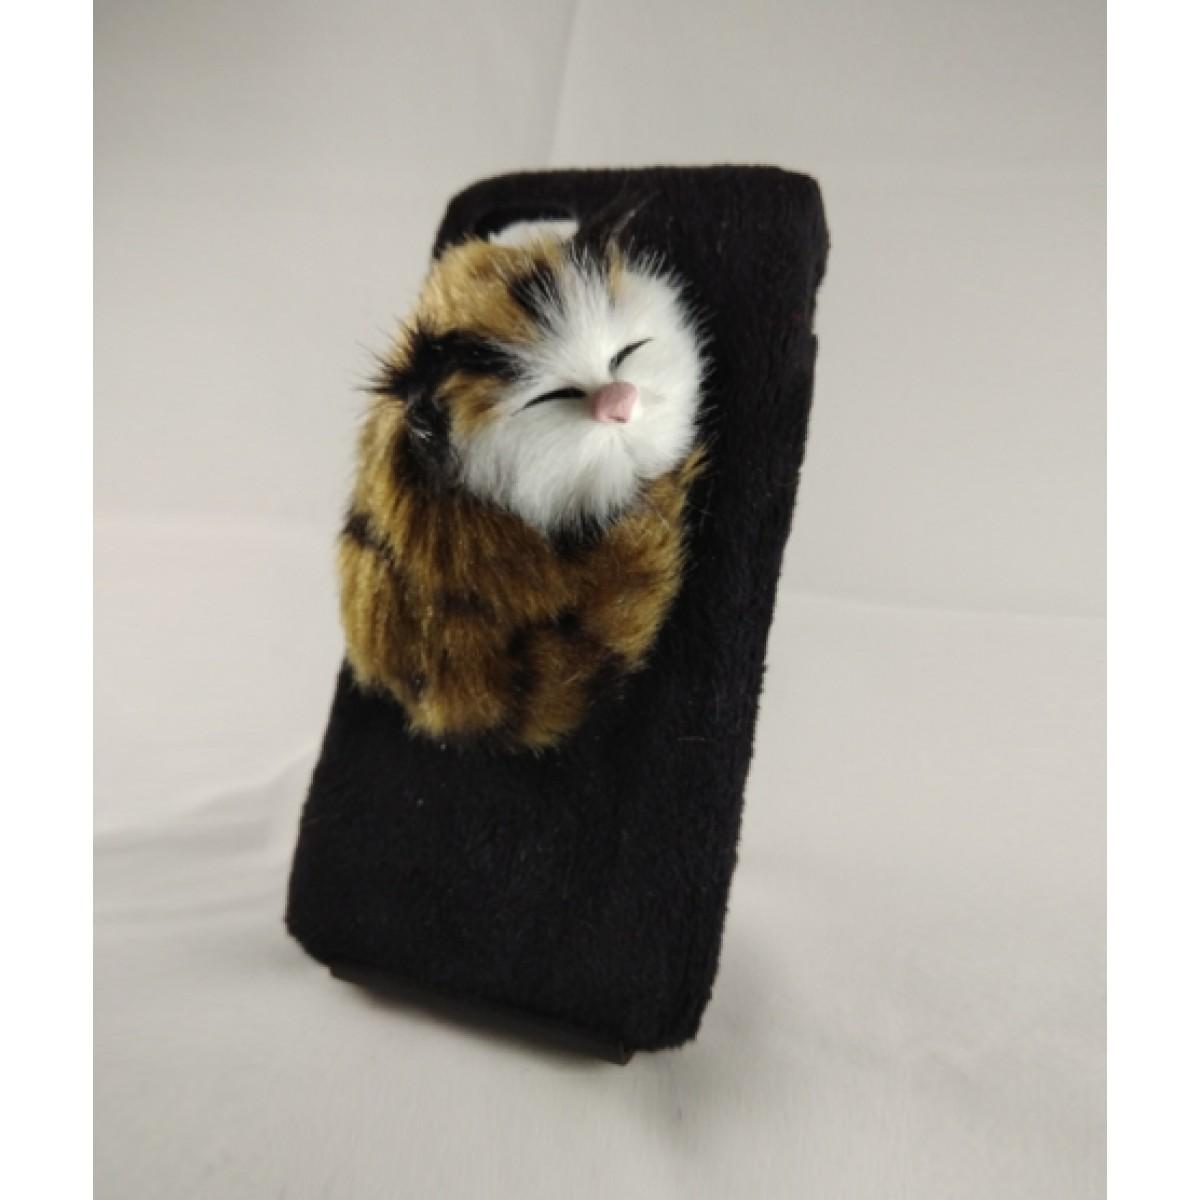 Sassy Sleeping Cat Black Case For iPhone 7 (1022)